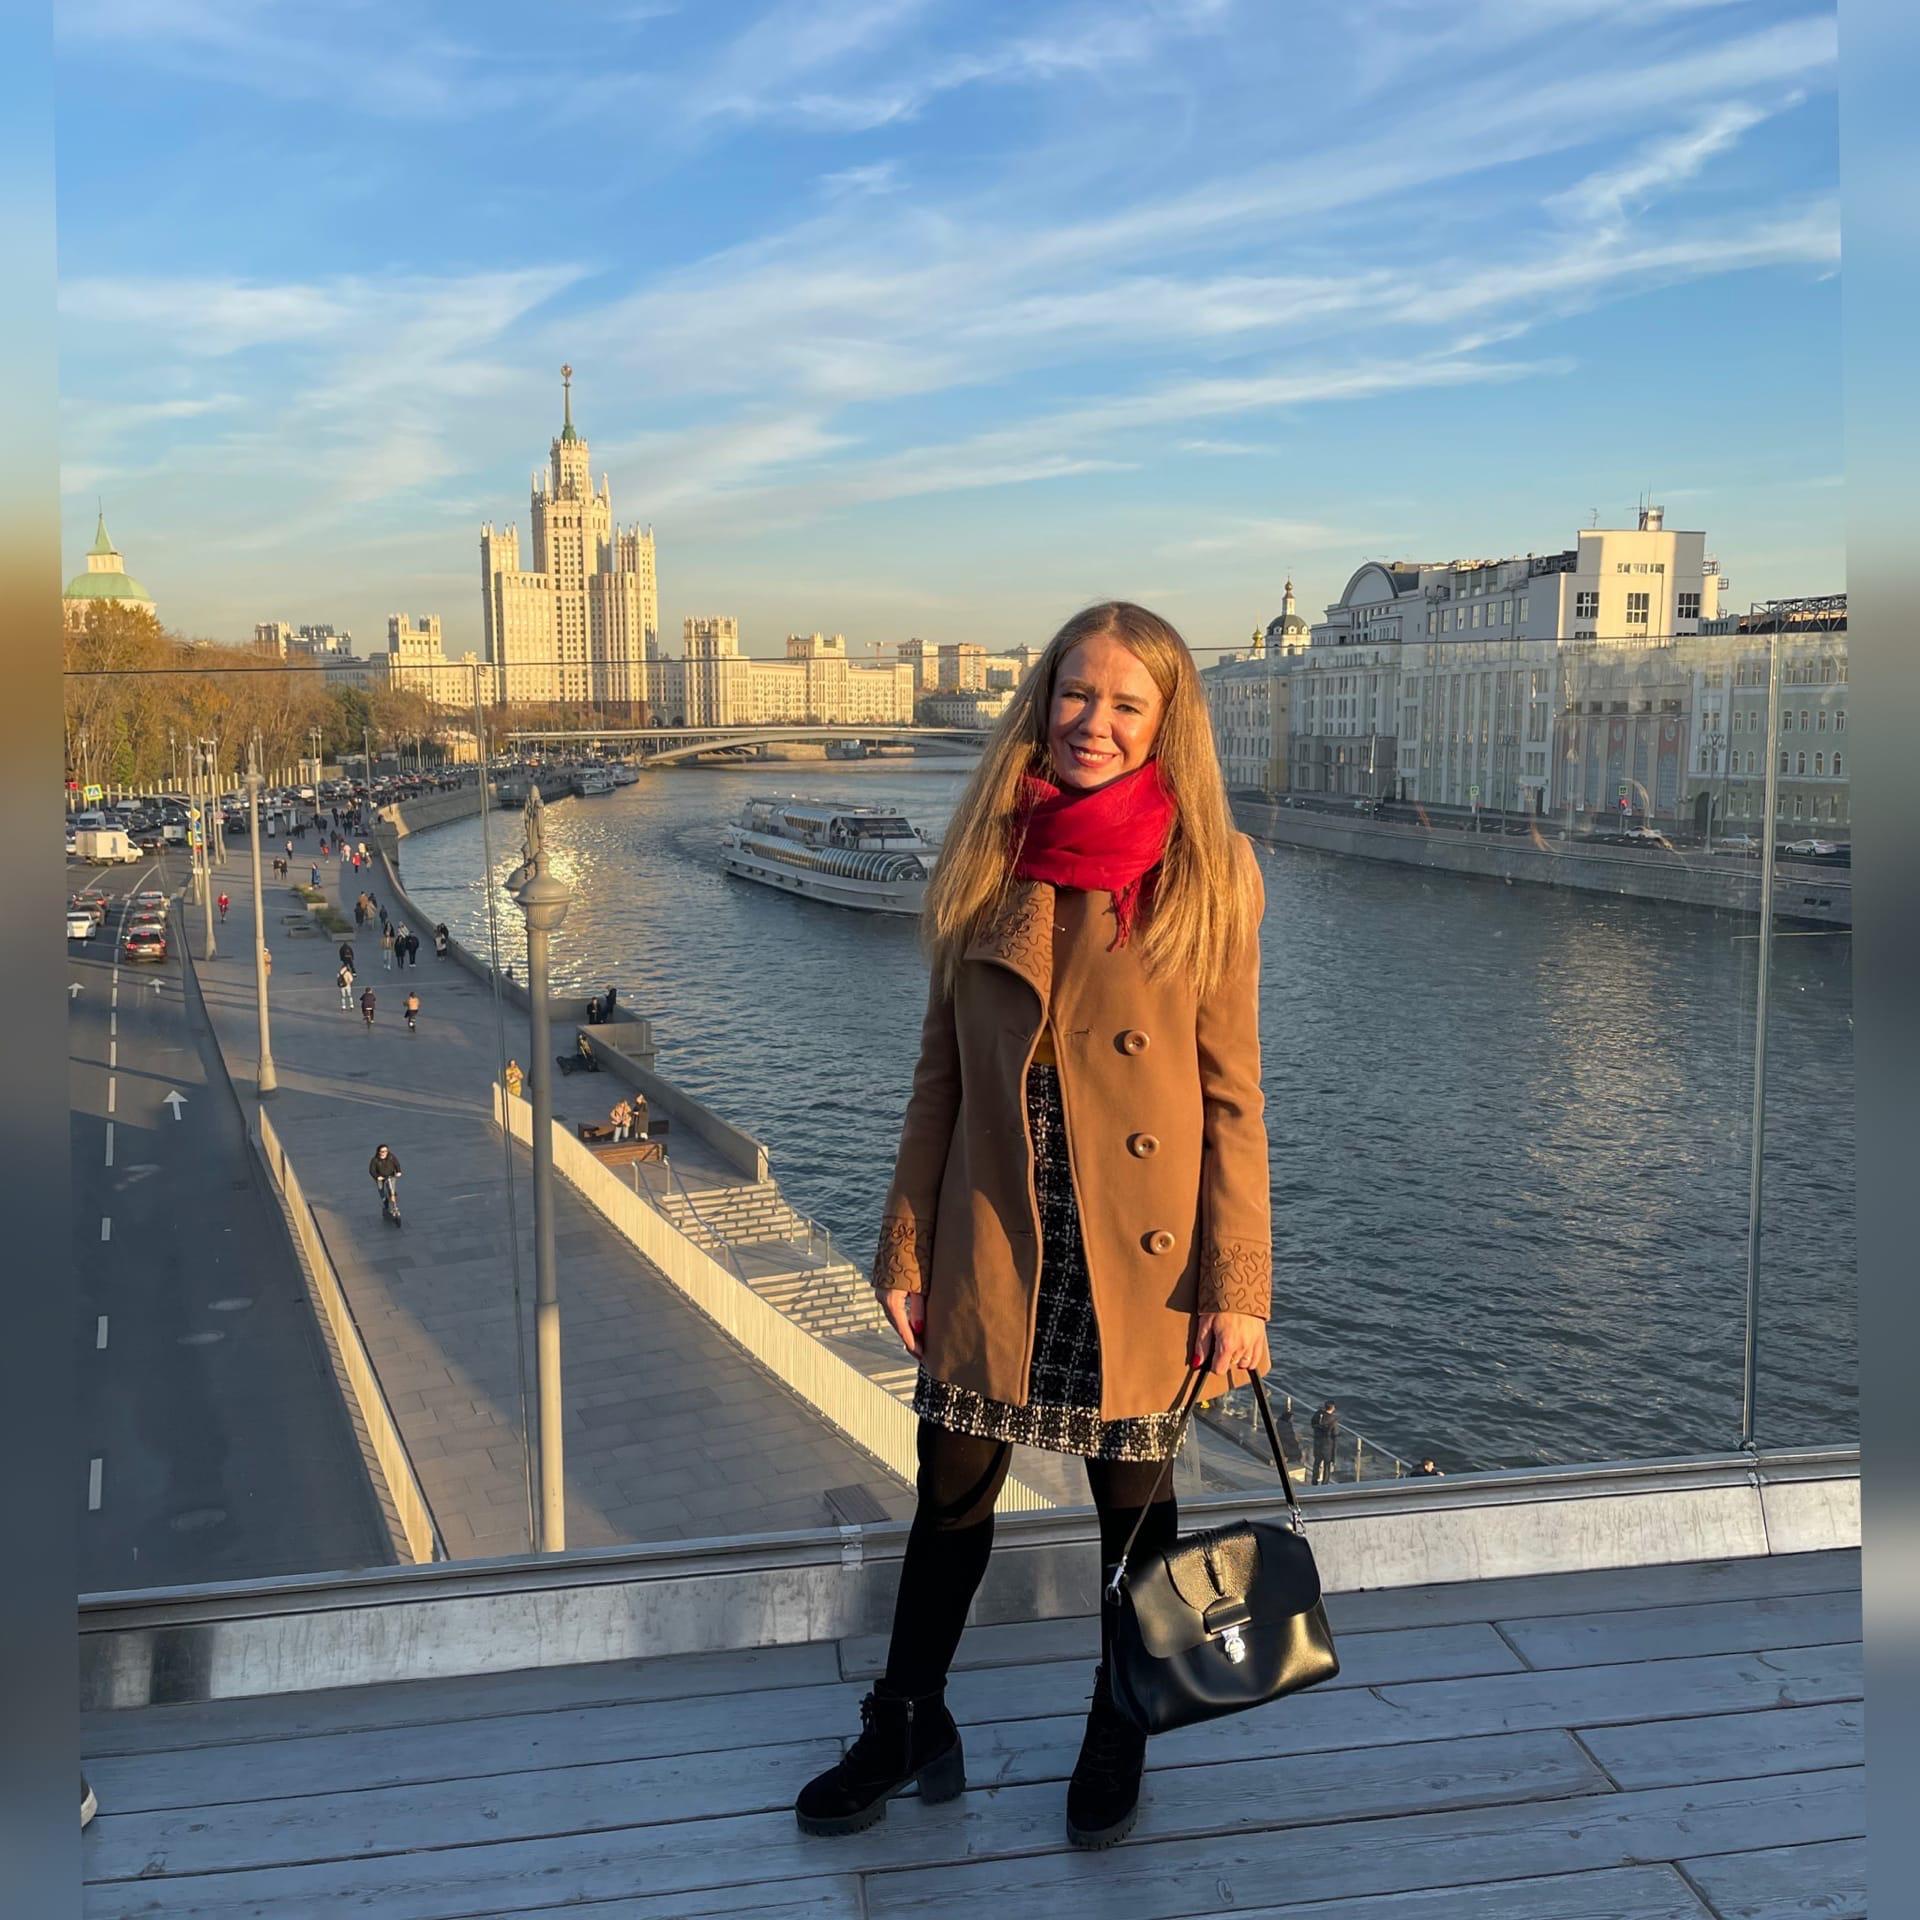 Привет  Елена 31 год Москва .